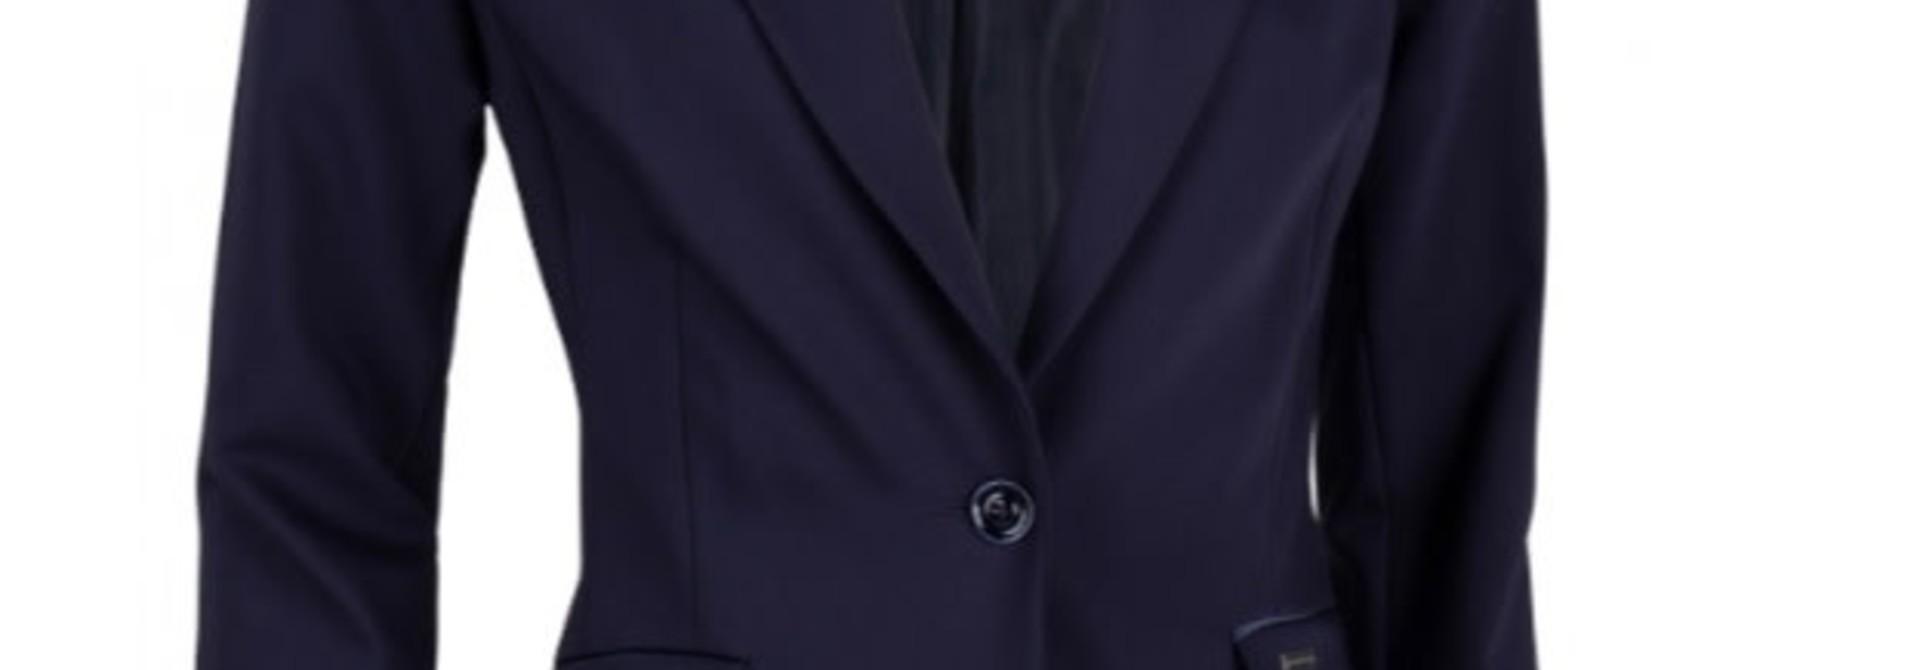 Anza blazer